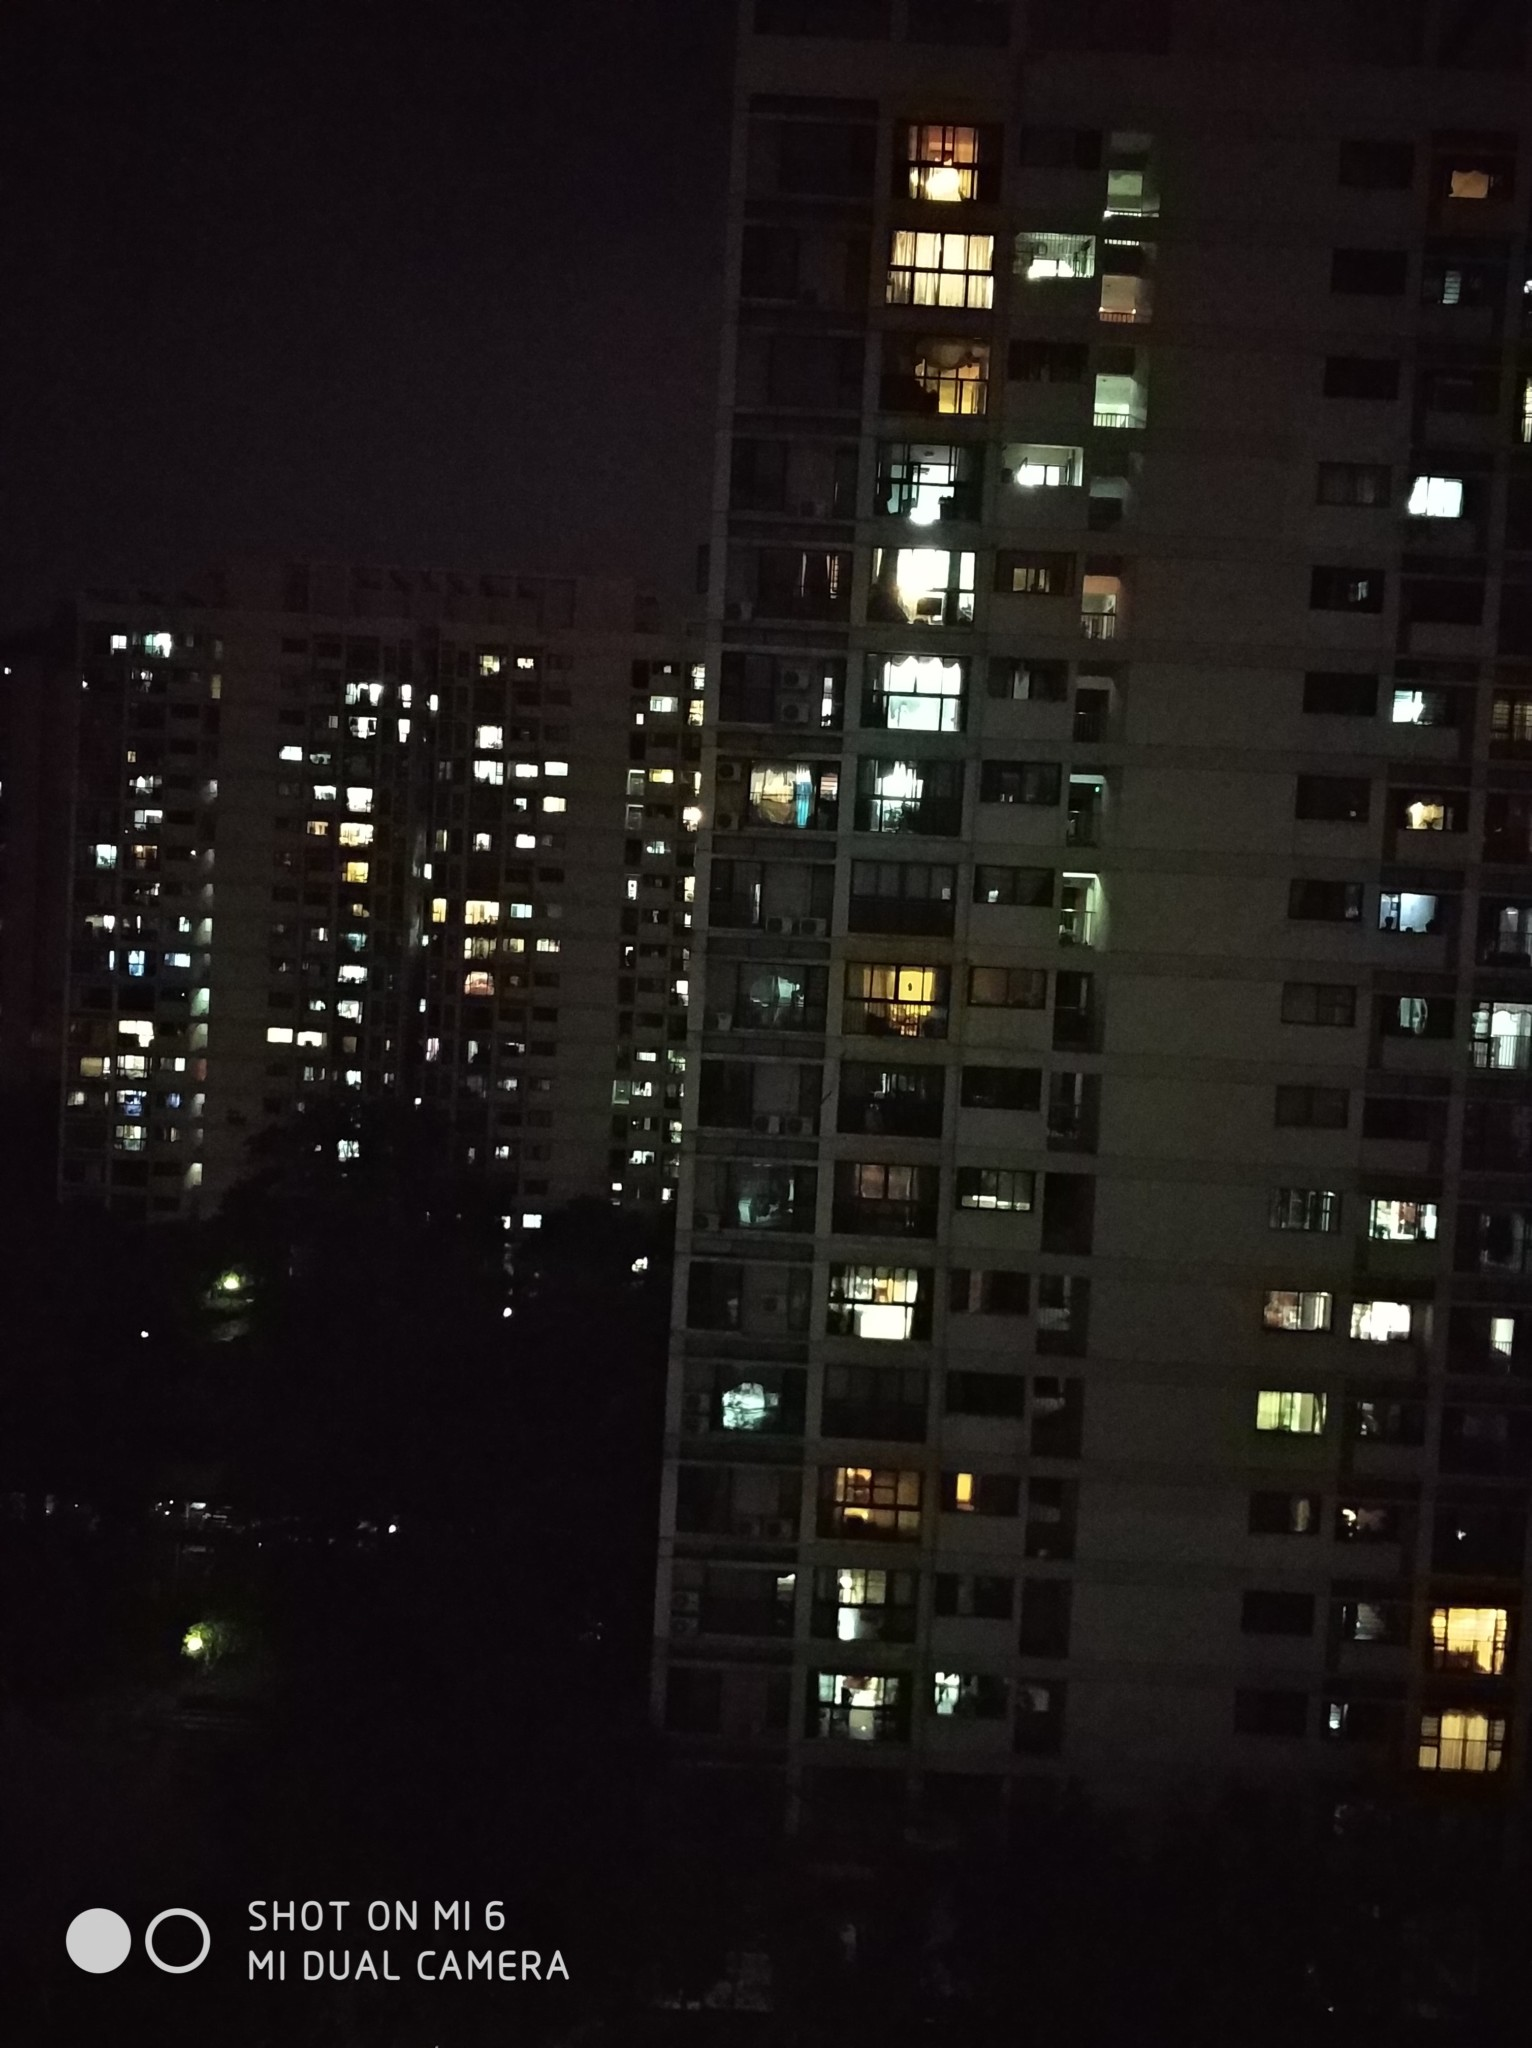 Xiaomi-Mi-6 2 камера сравнение